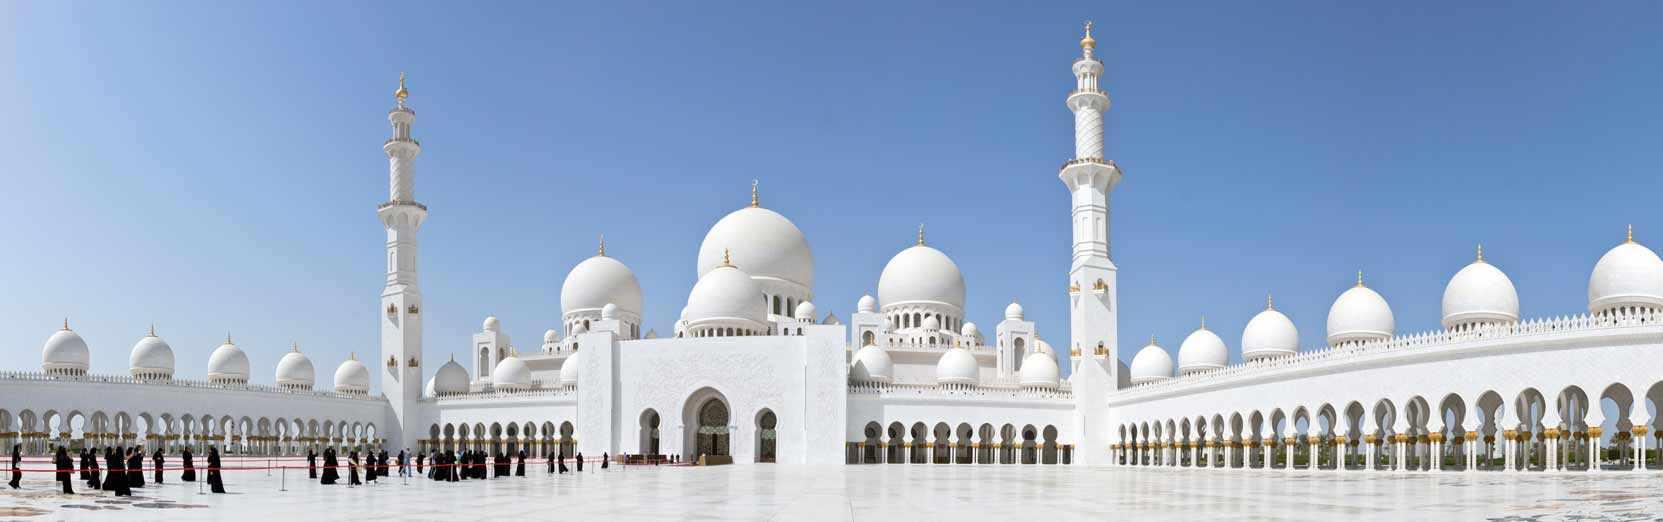 Auto mieten in Abu Dhabi